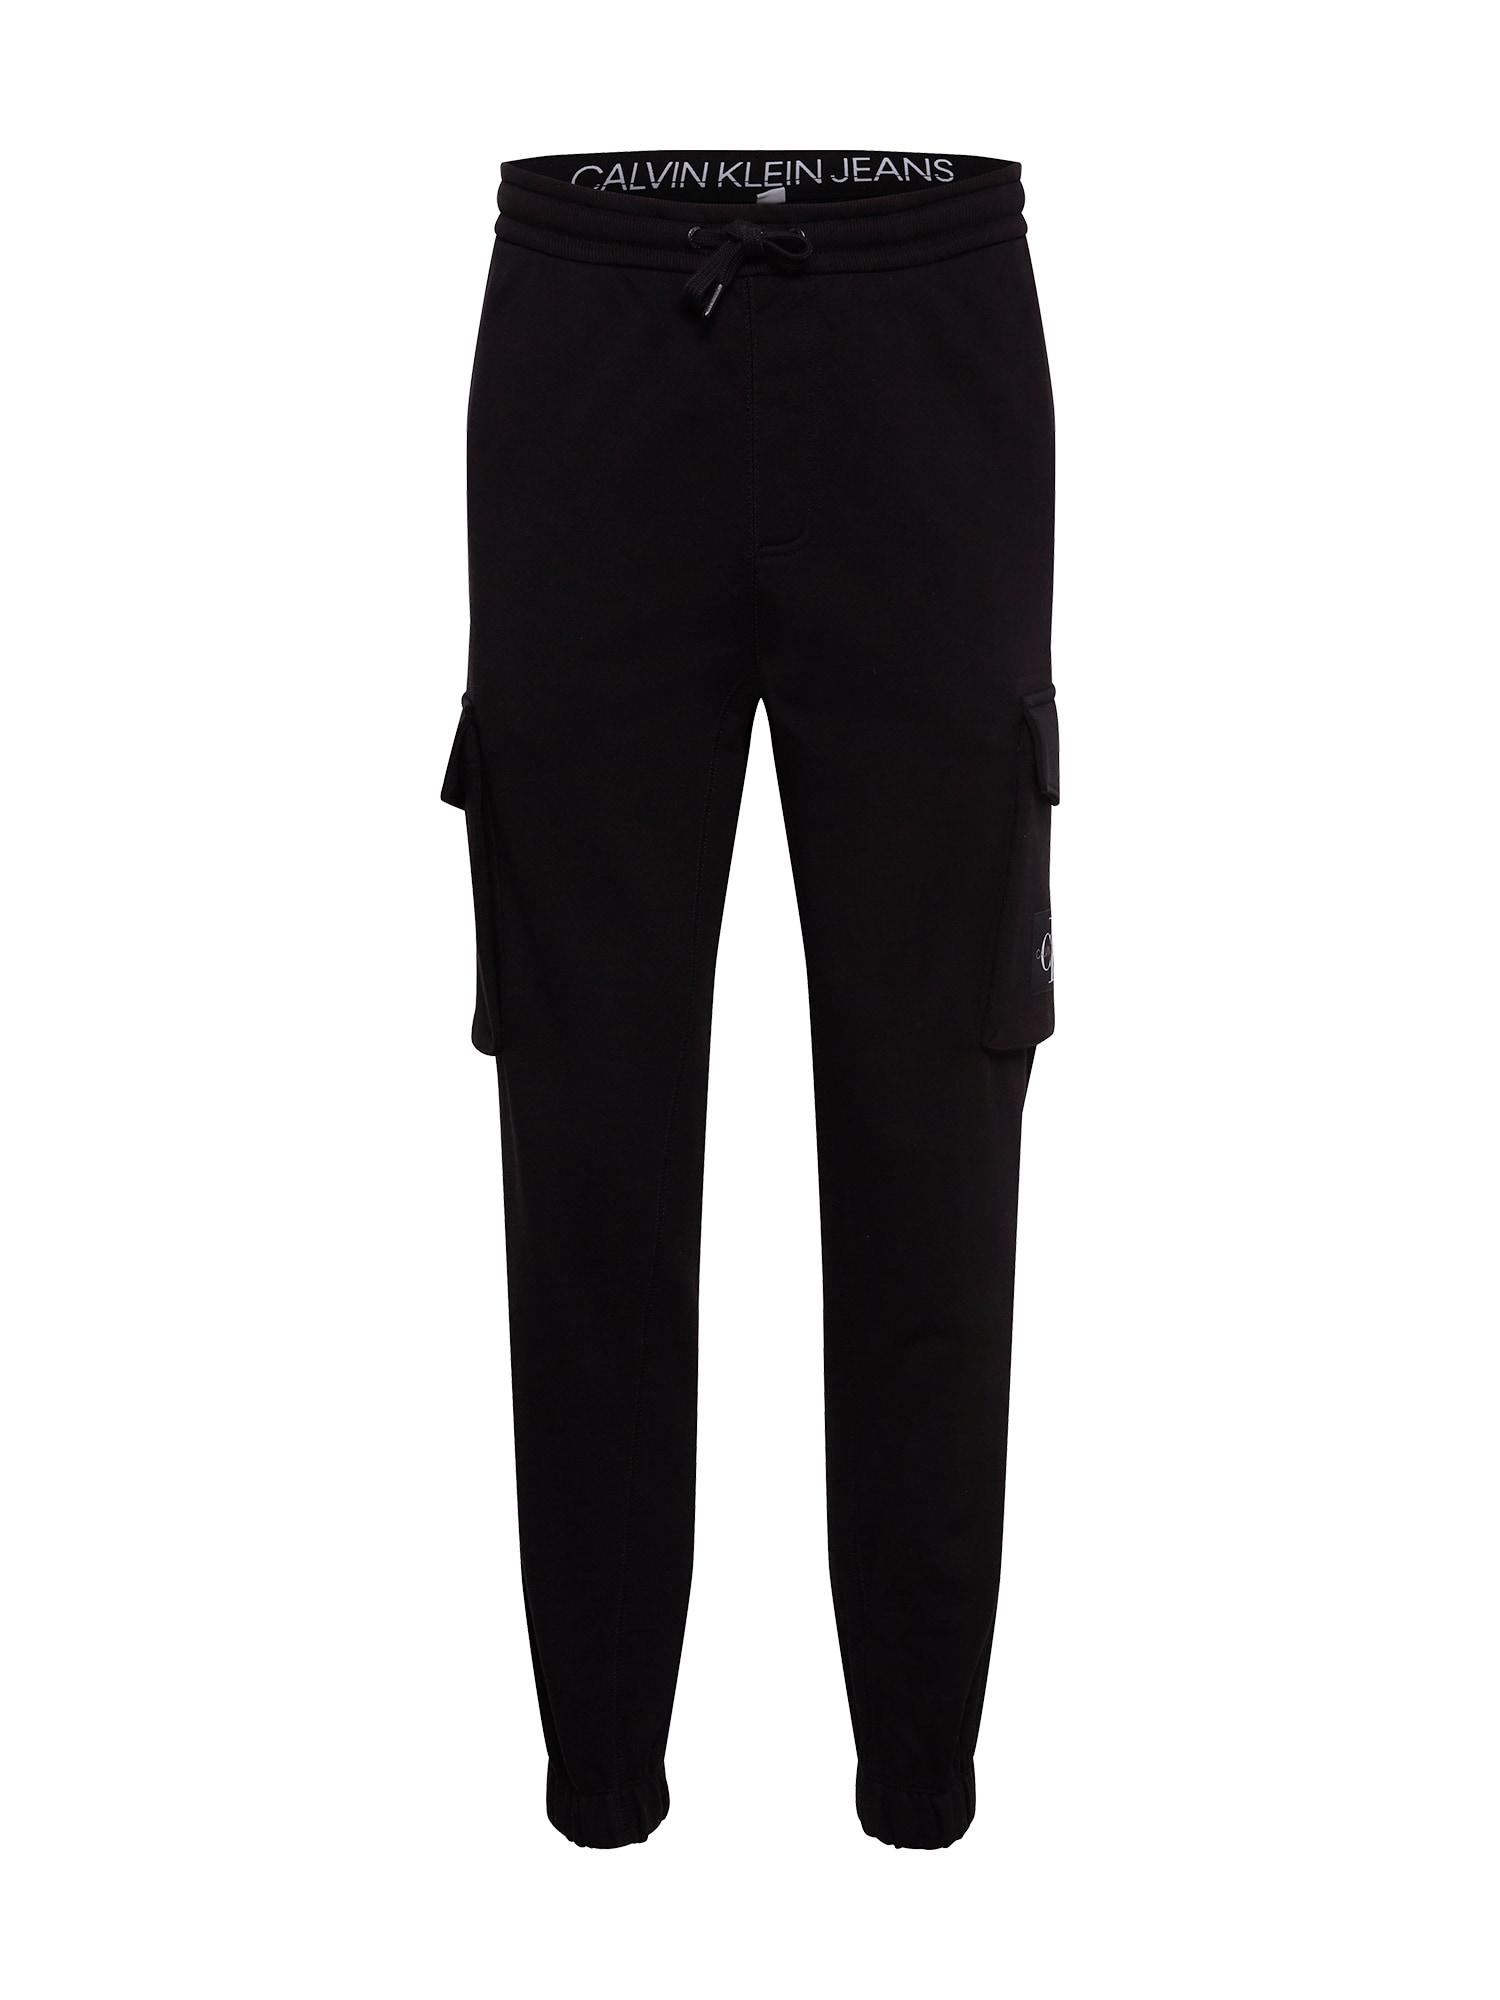 Calvin Klein Jeans Laisvo stiliaus kelnės juoda / balta